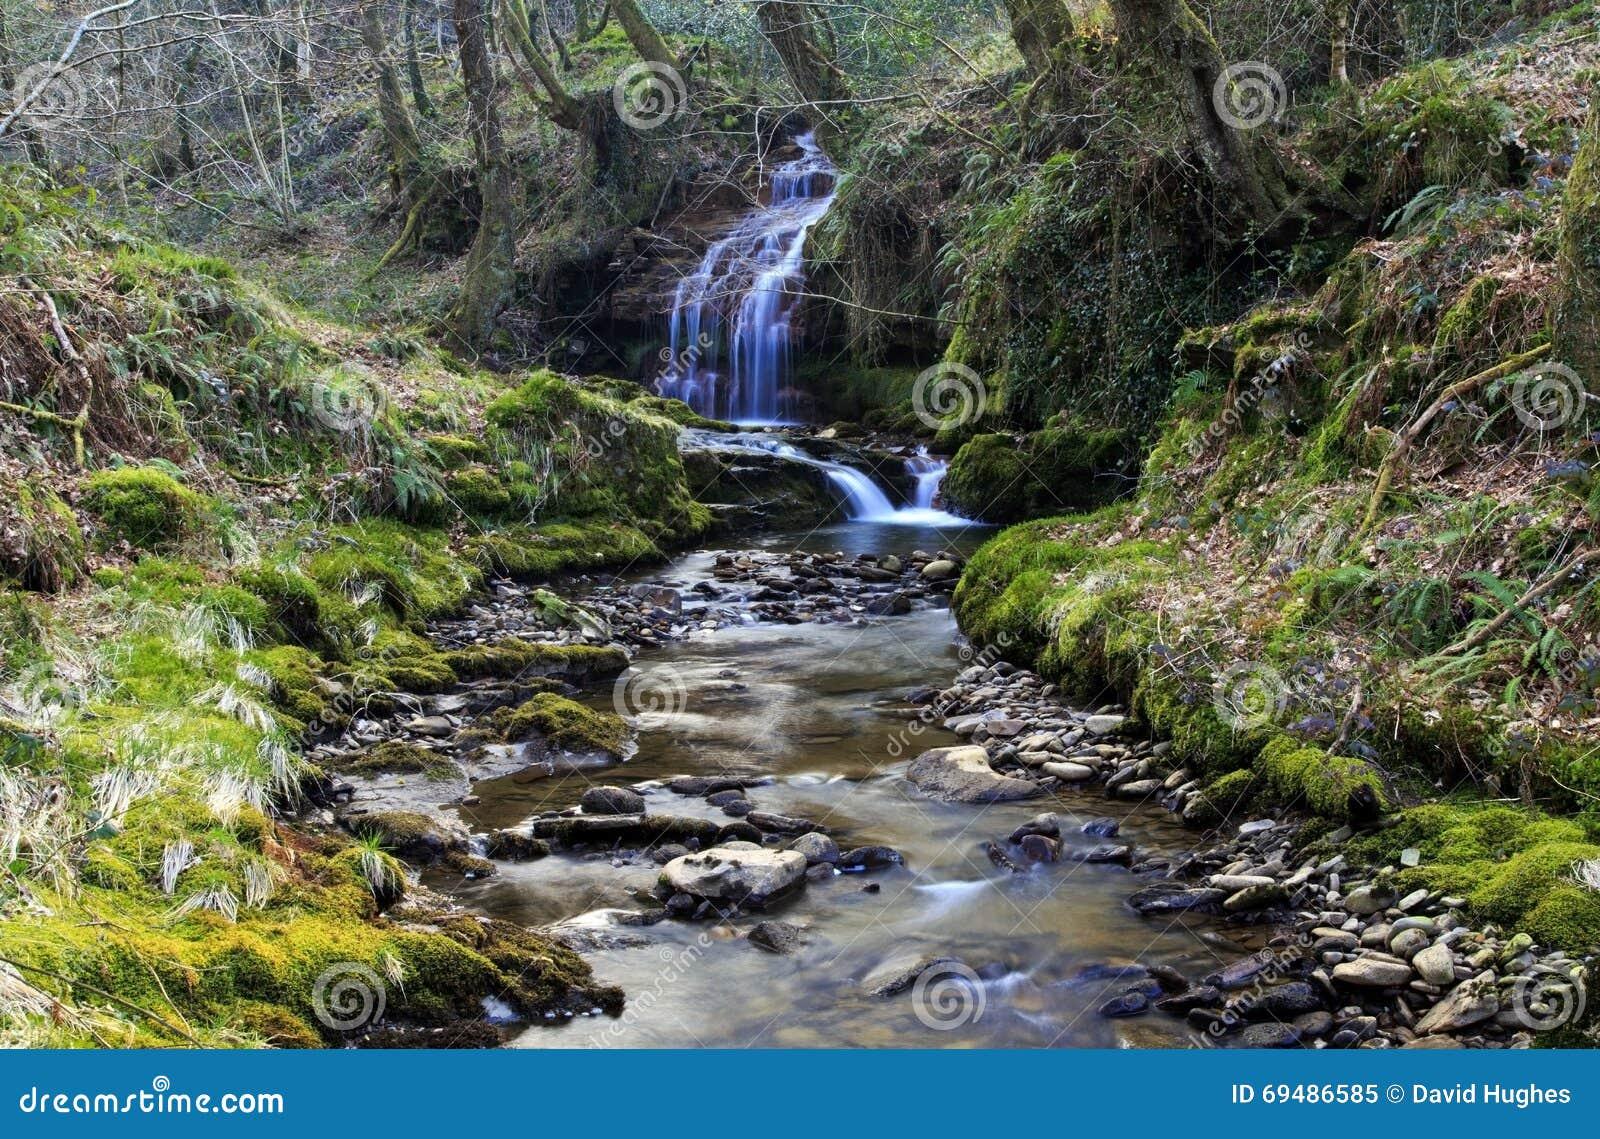 Small waterfall, Creunant just below Pwll y Alun